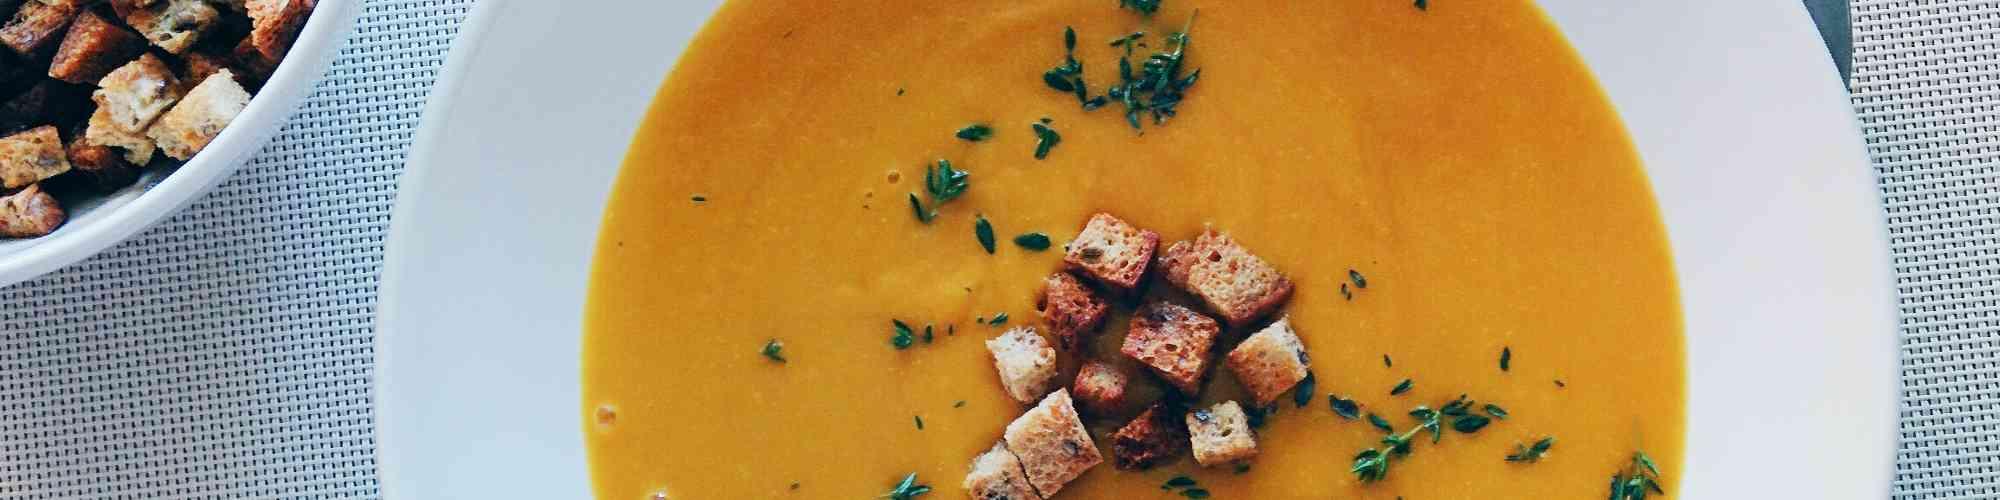 https://s3.amazonaws.com/ka-images-prod/mastheads/pumpkin-soup-2.jpg